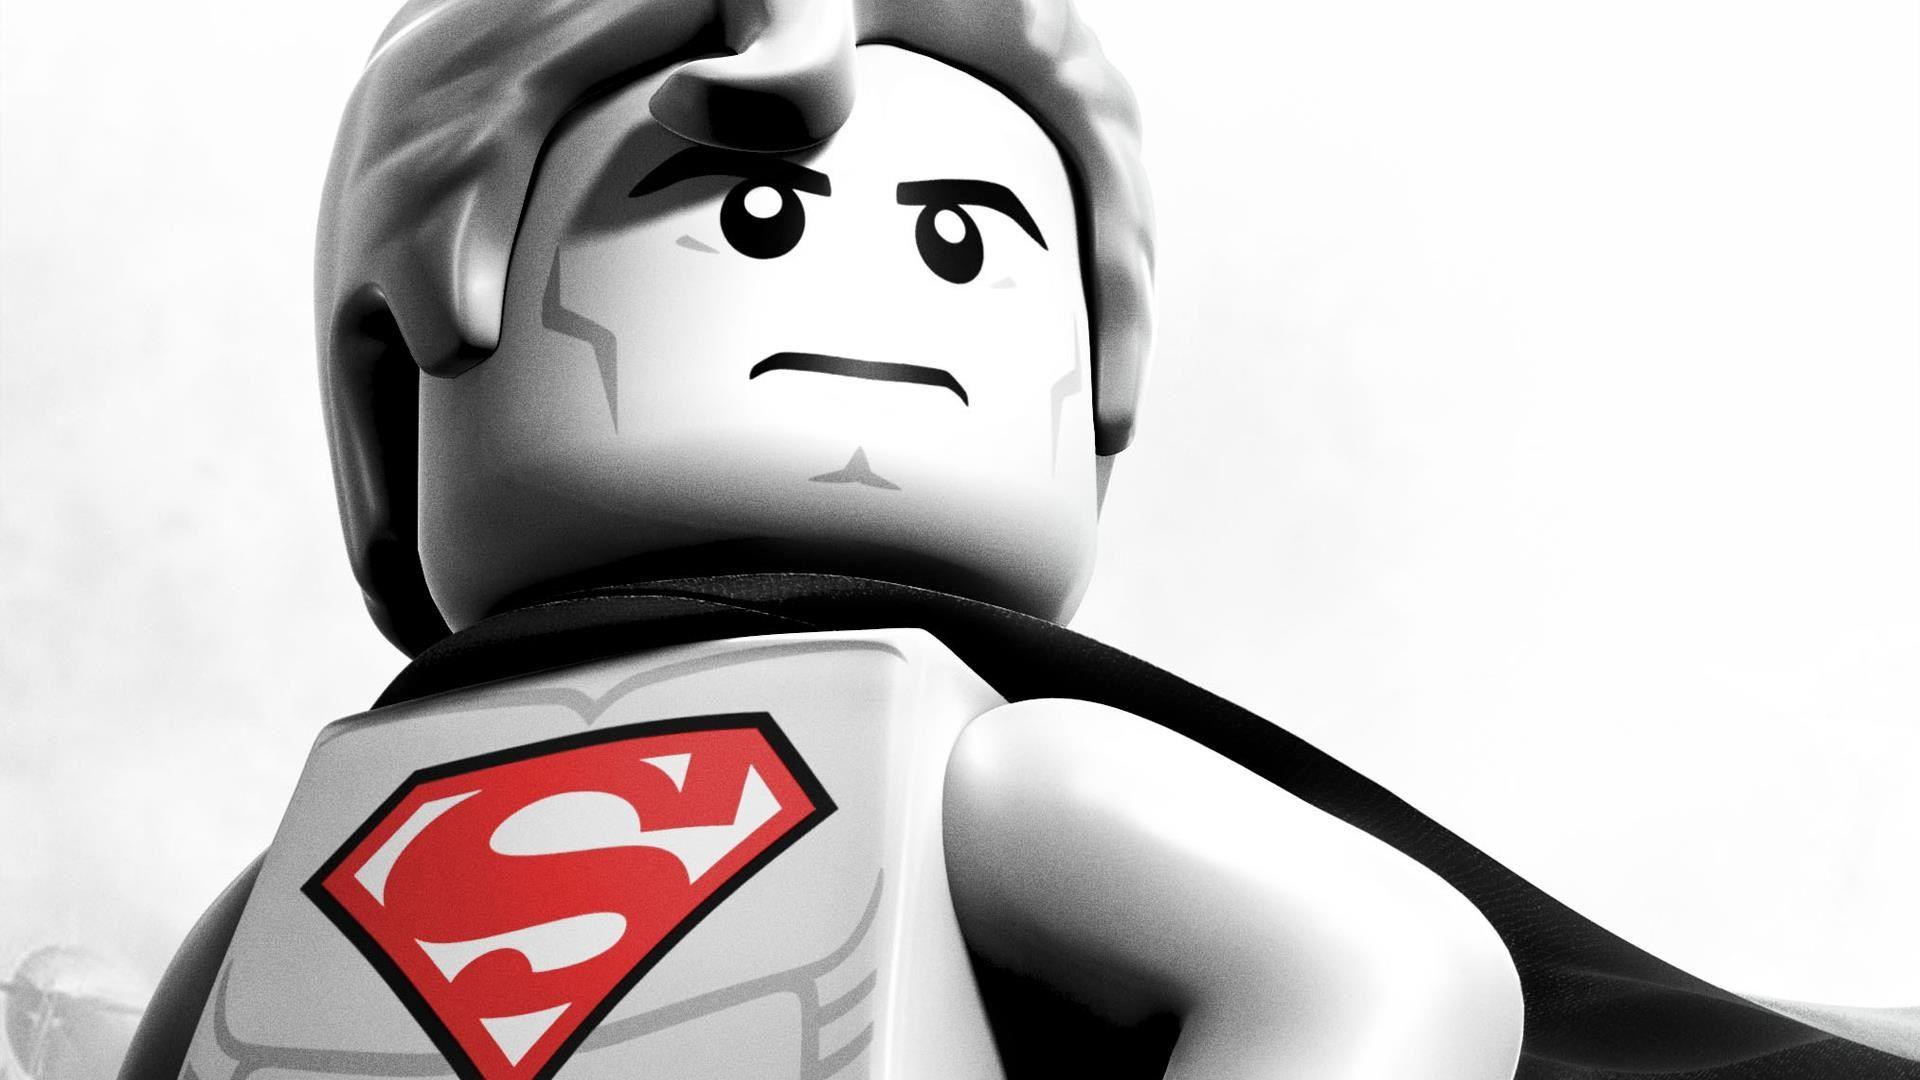 Photos Download Image Lego Hd Wallpapers Lego Batman 2 Lego